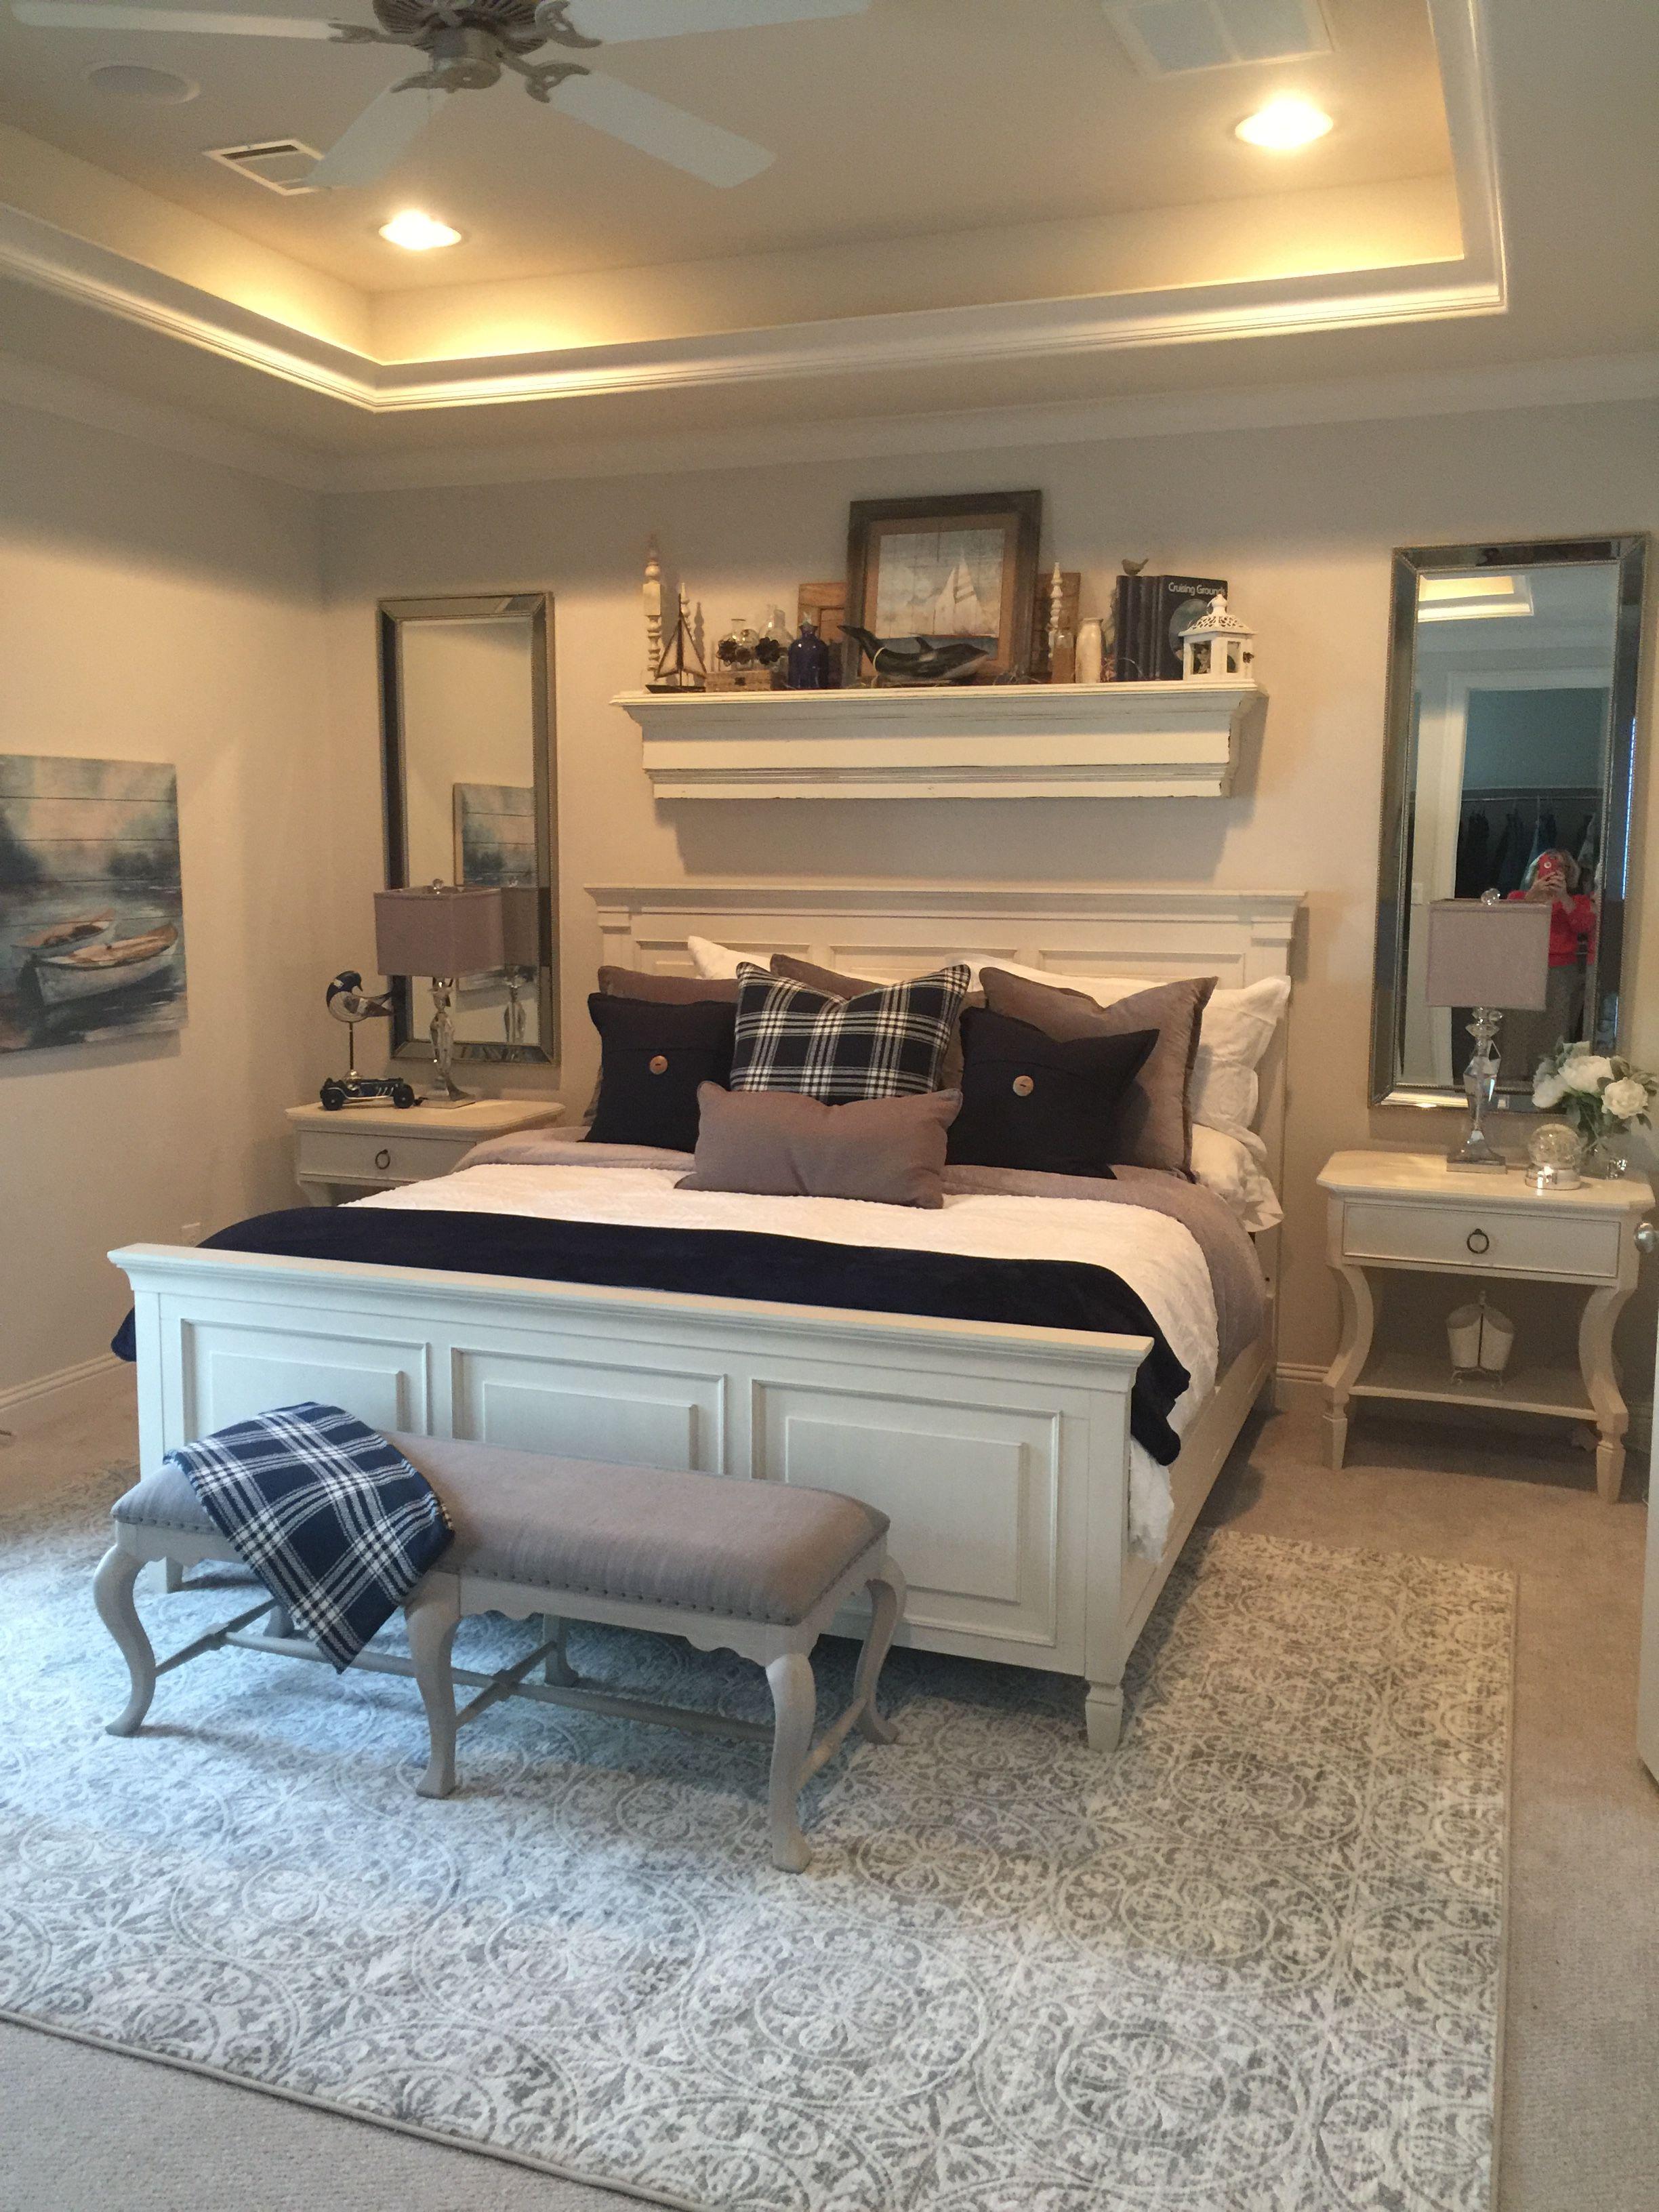 Coastal farmhouse glam master bedroom. This was a fun